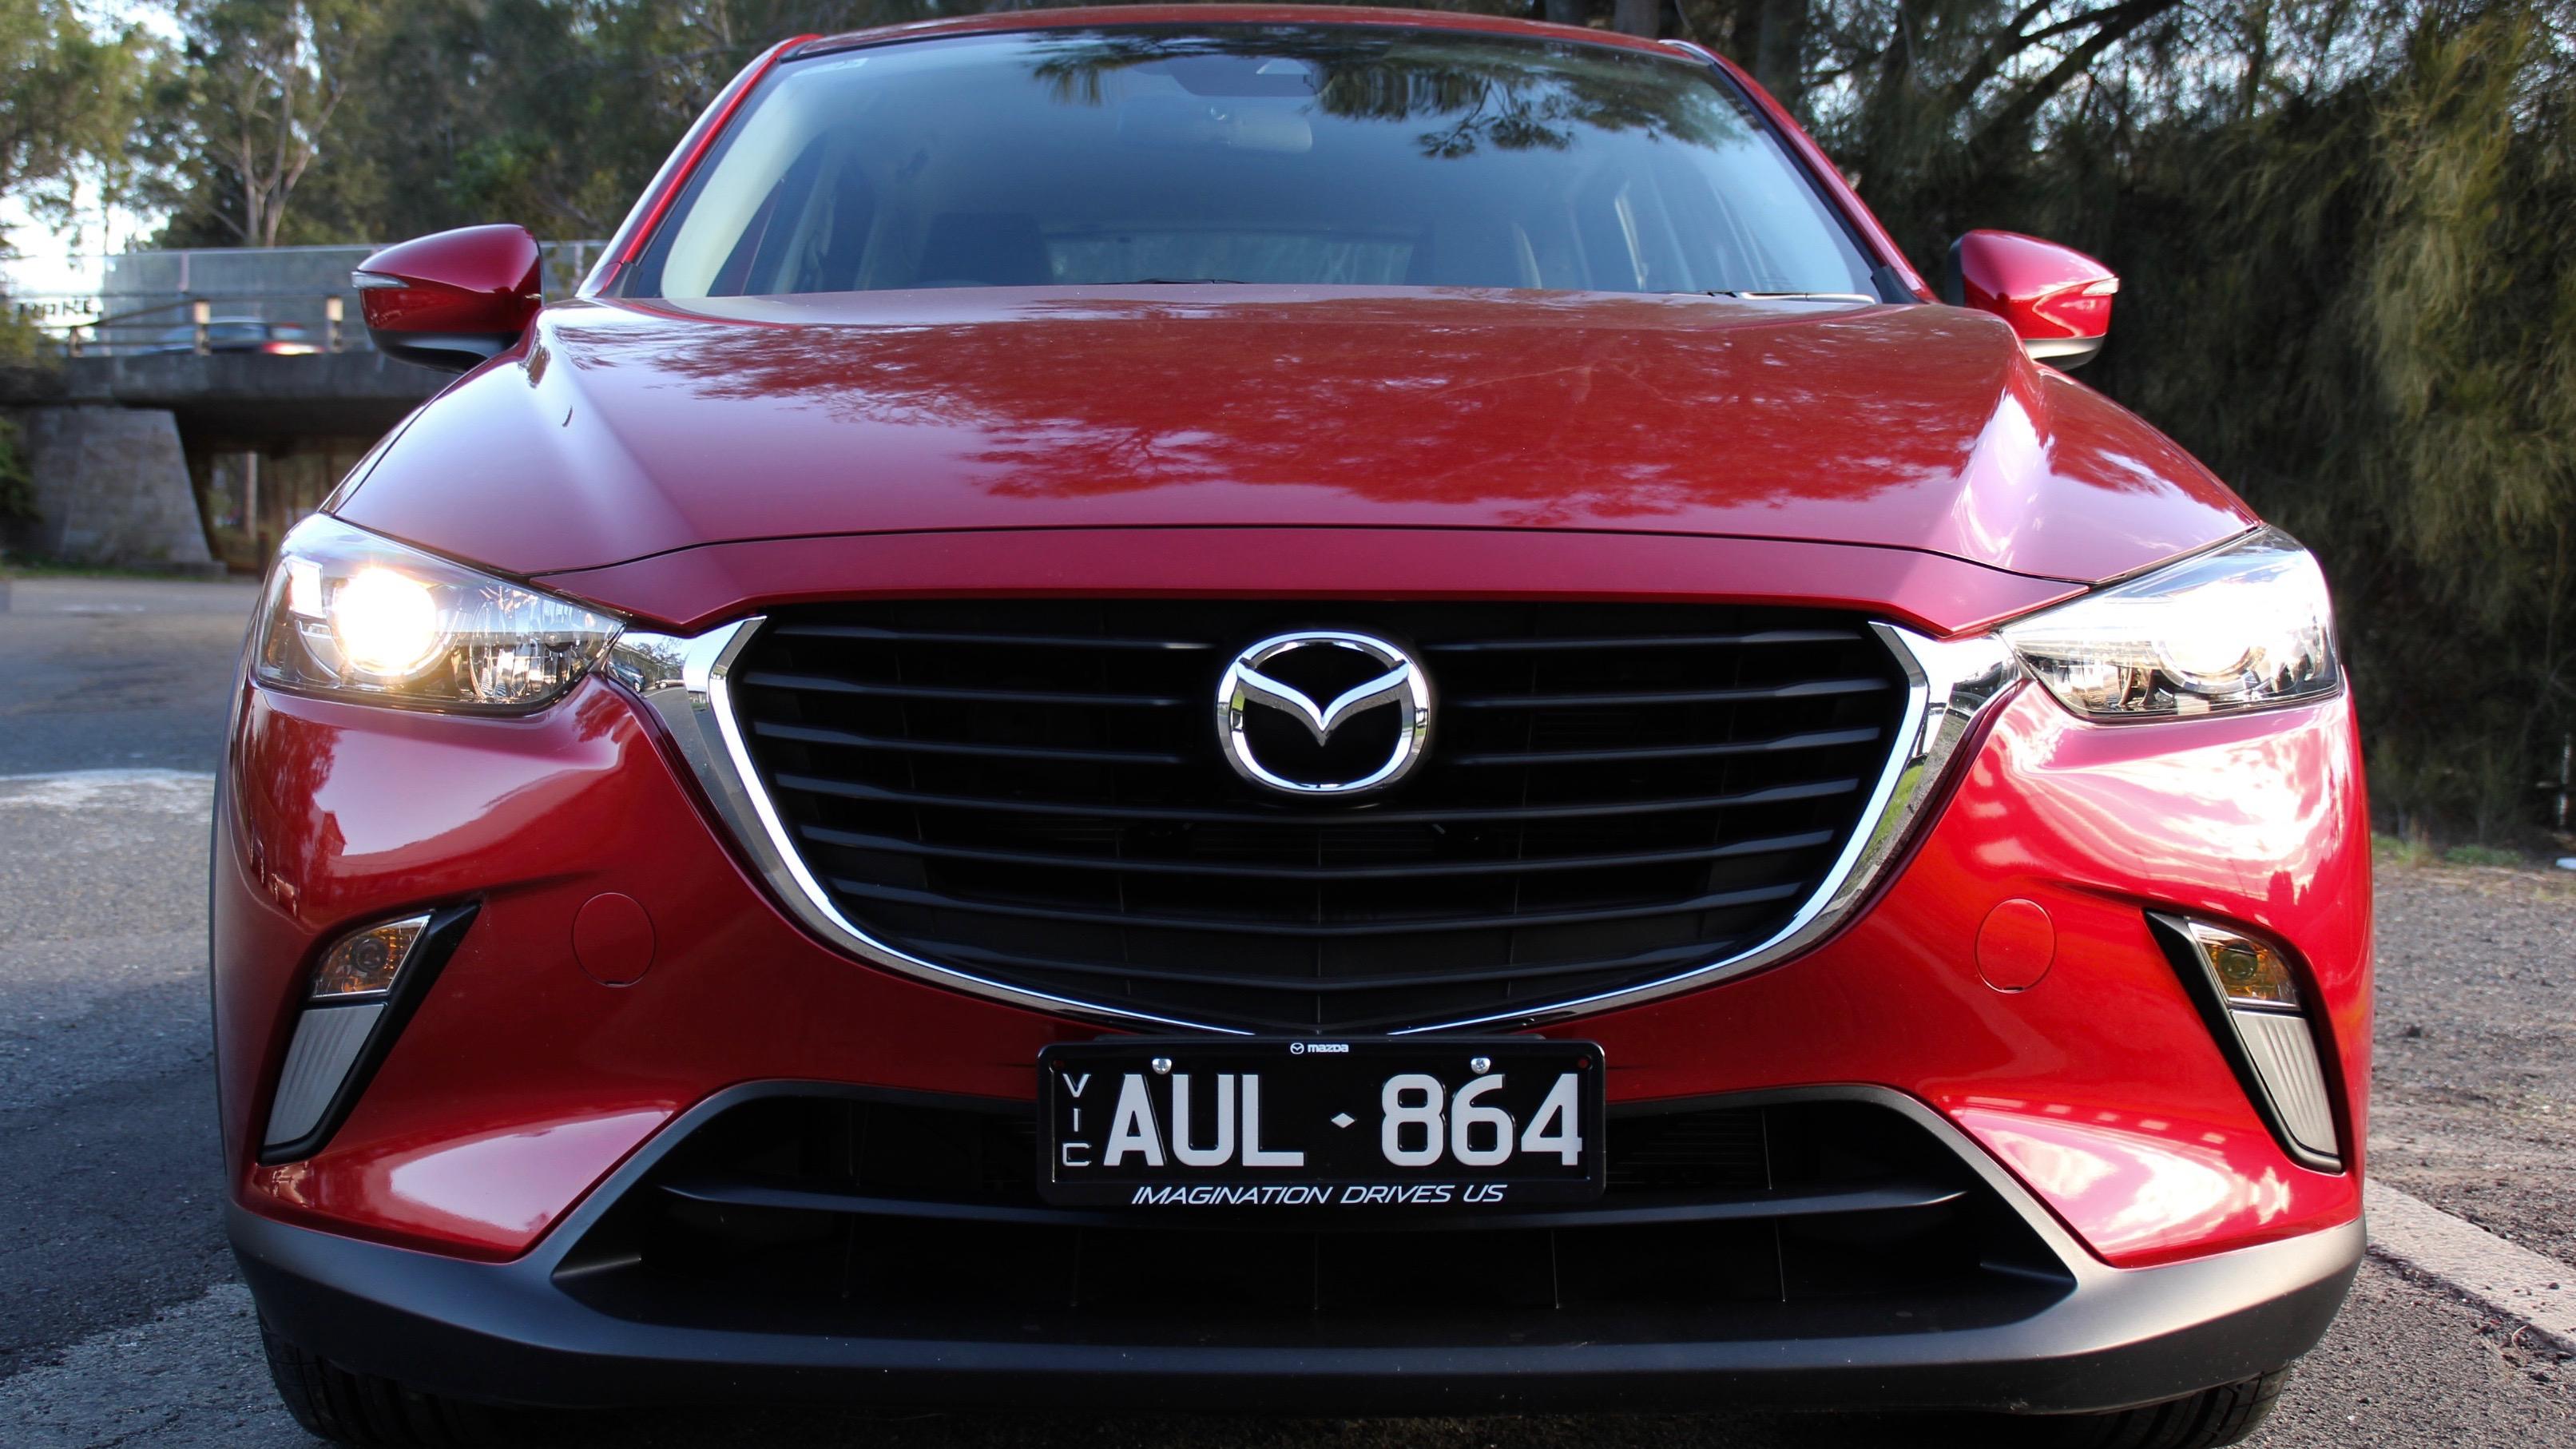 2018 Mazda CX-3 front detail